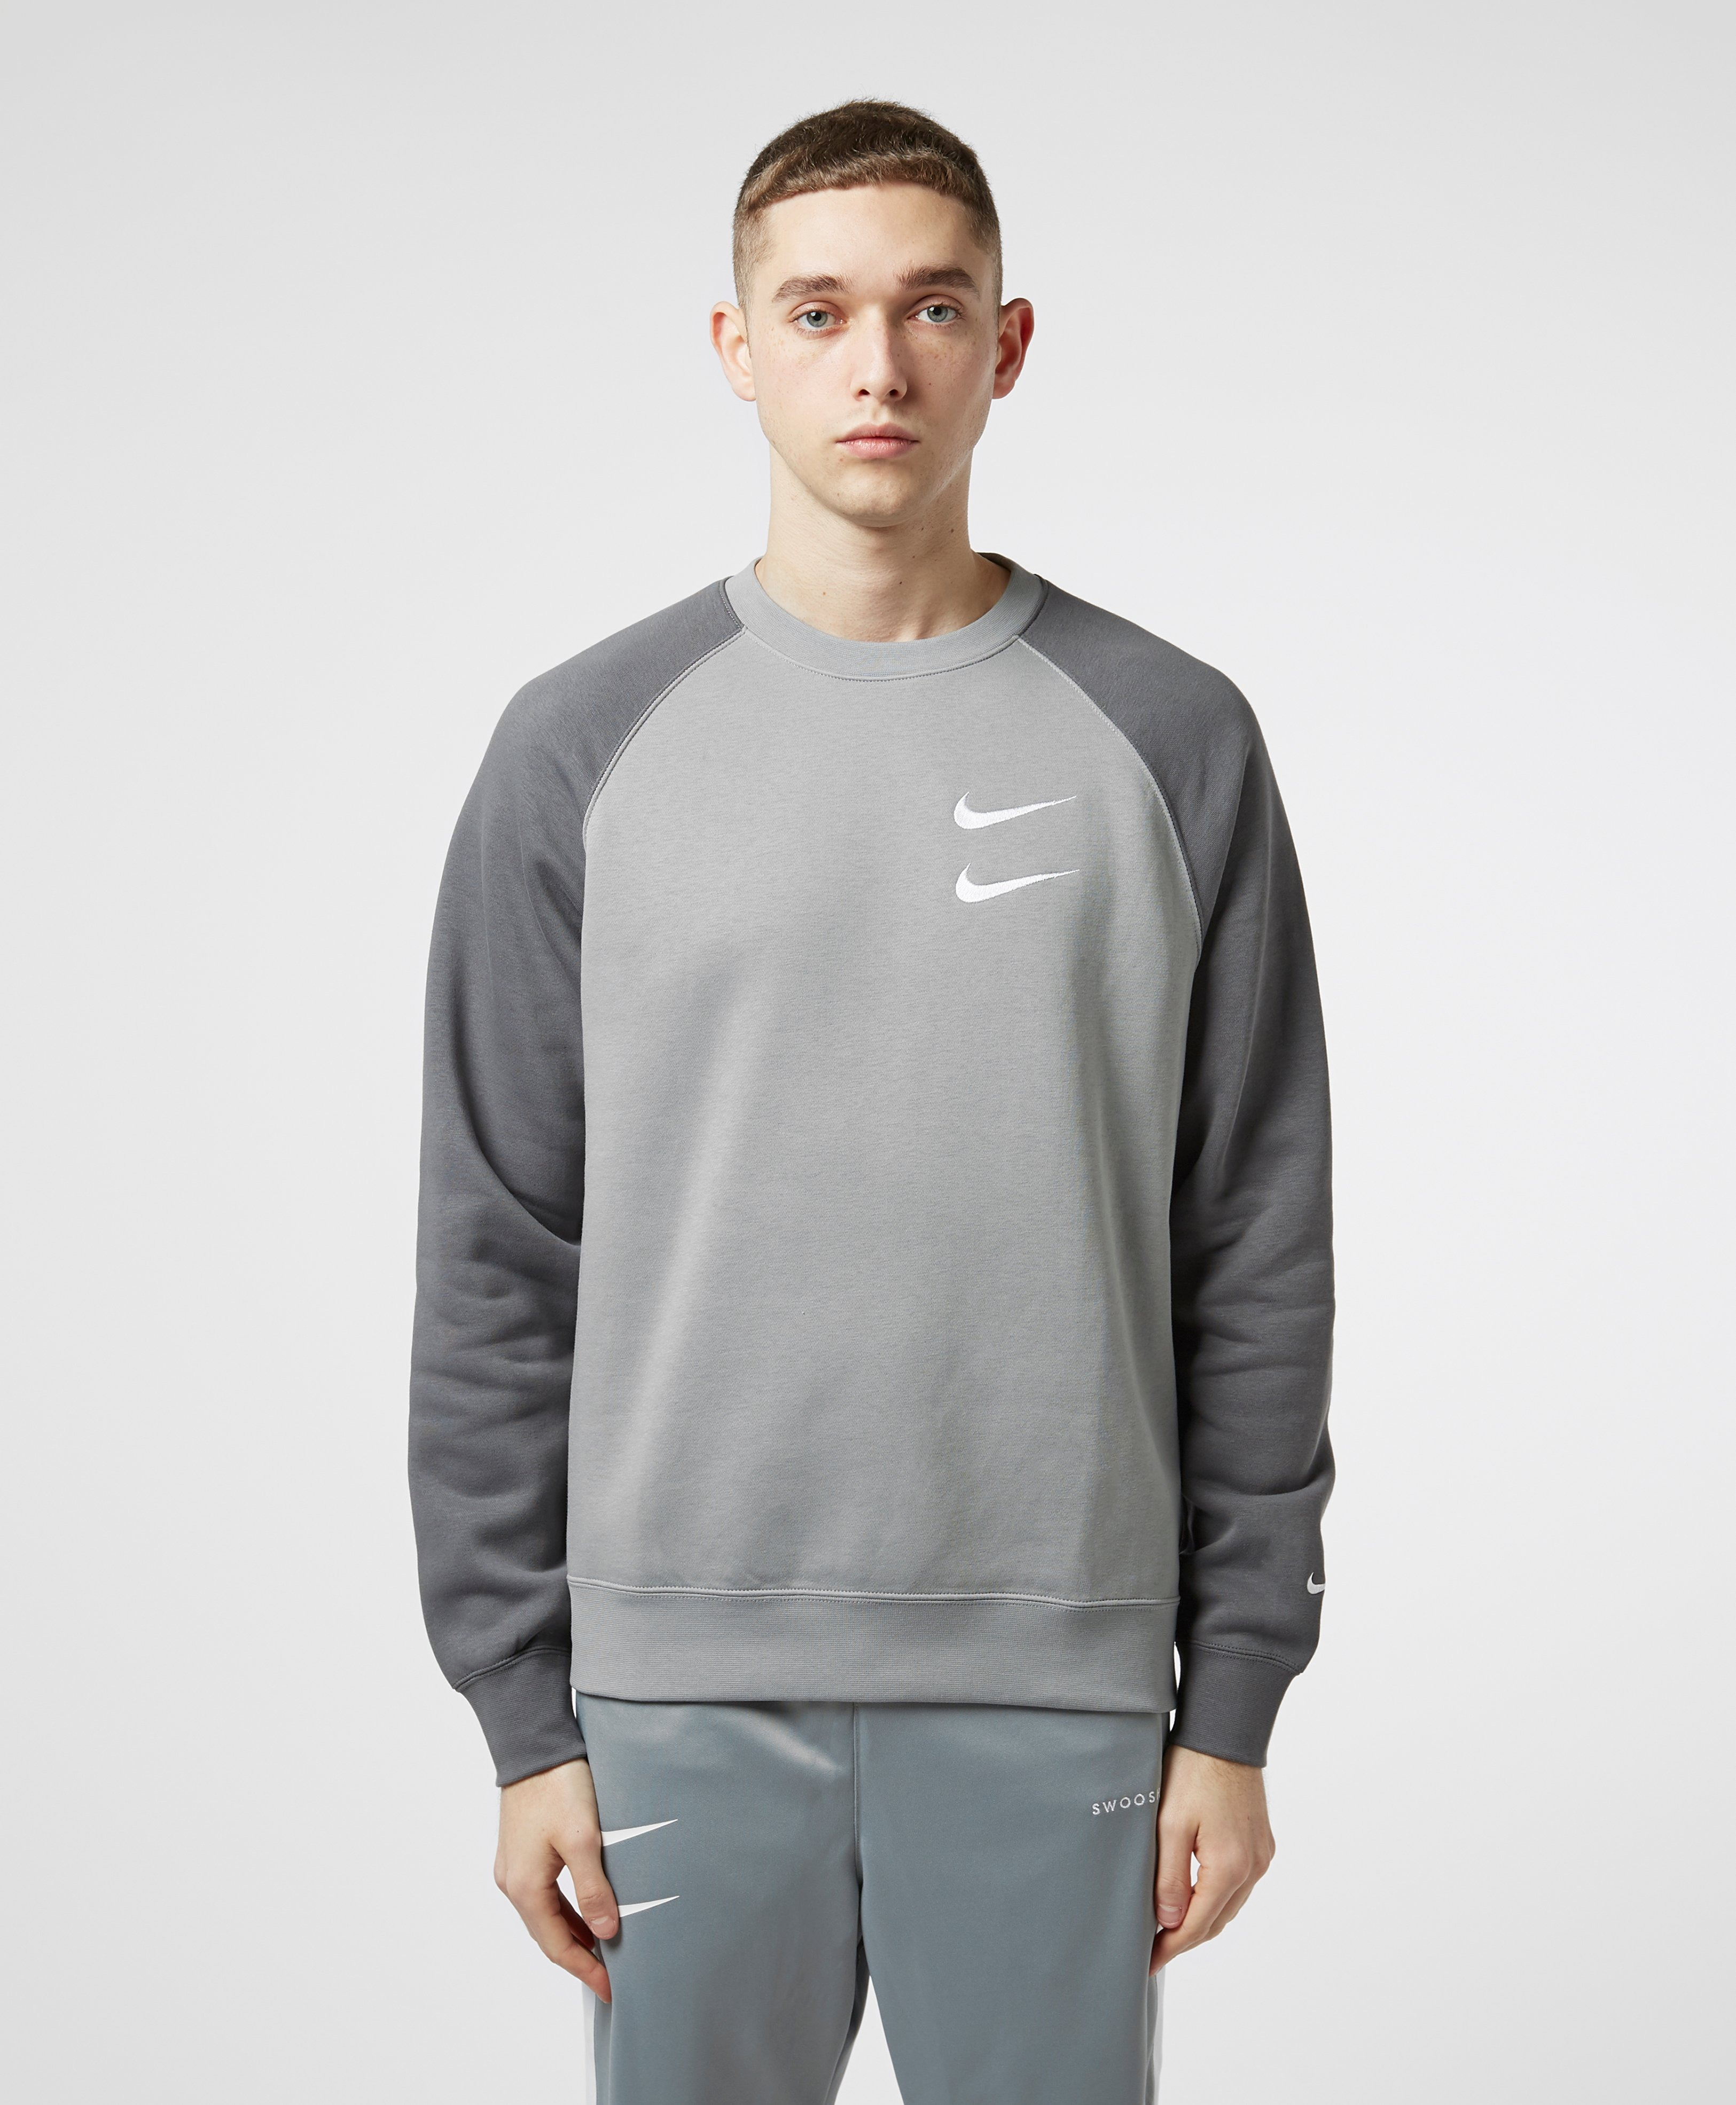 nike hoodie double swoosh